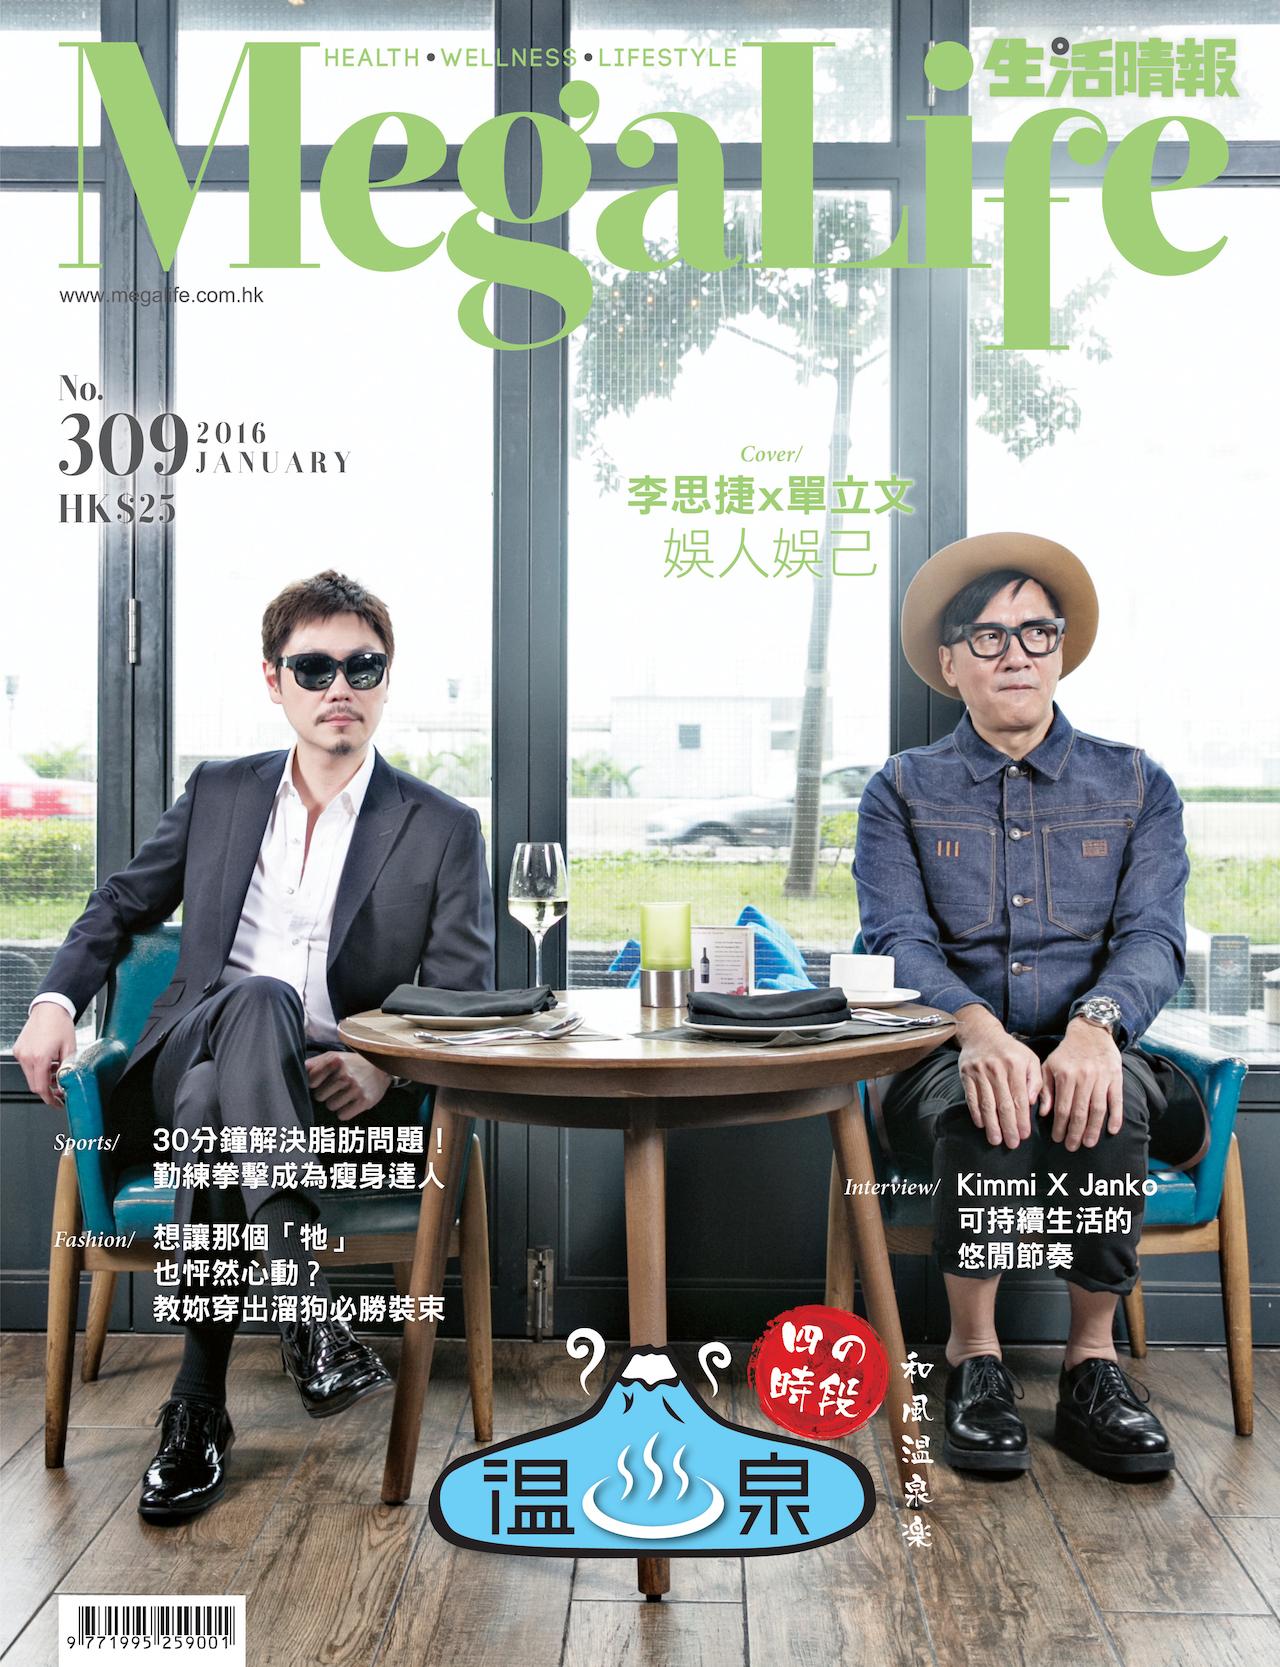 Cover(J)_309jan_FA_ok1